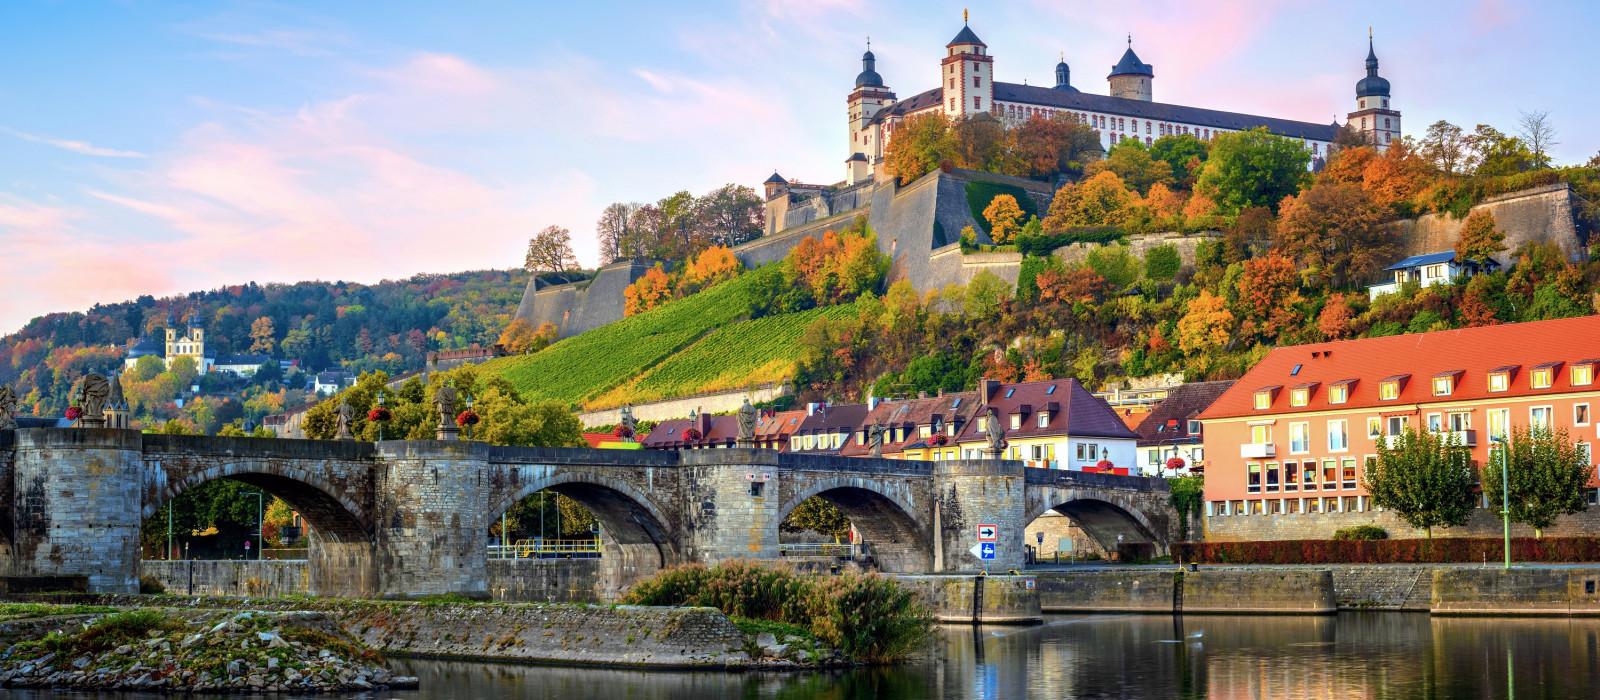 Destination Wurzburg Germany